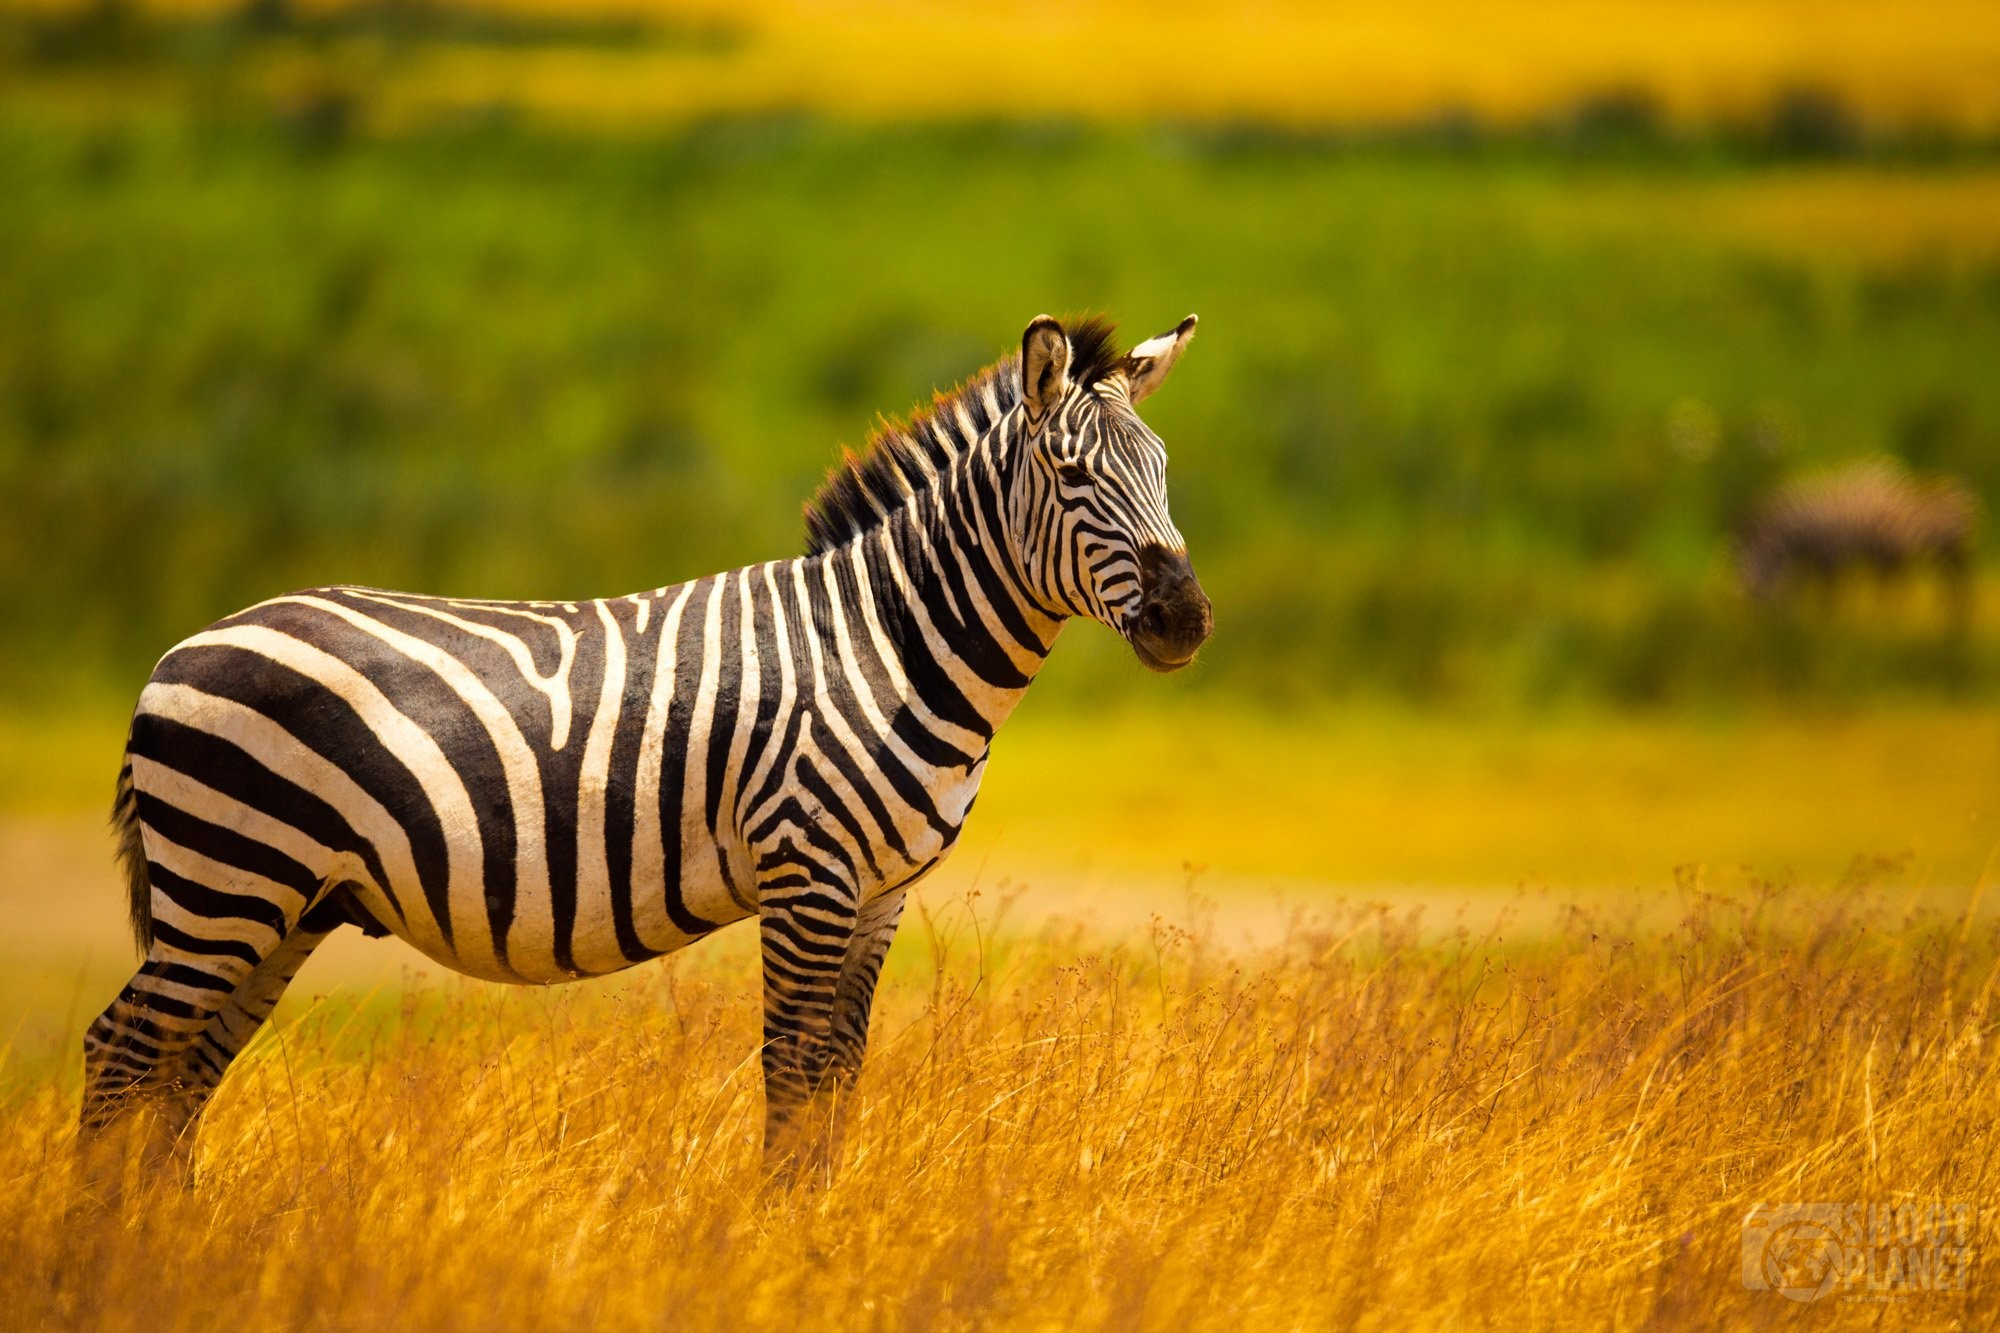 Plain zebra in Ngorongoro caldera savanna, Tanzania